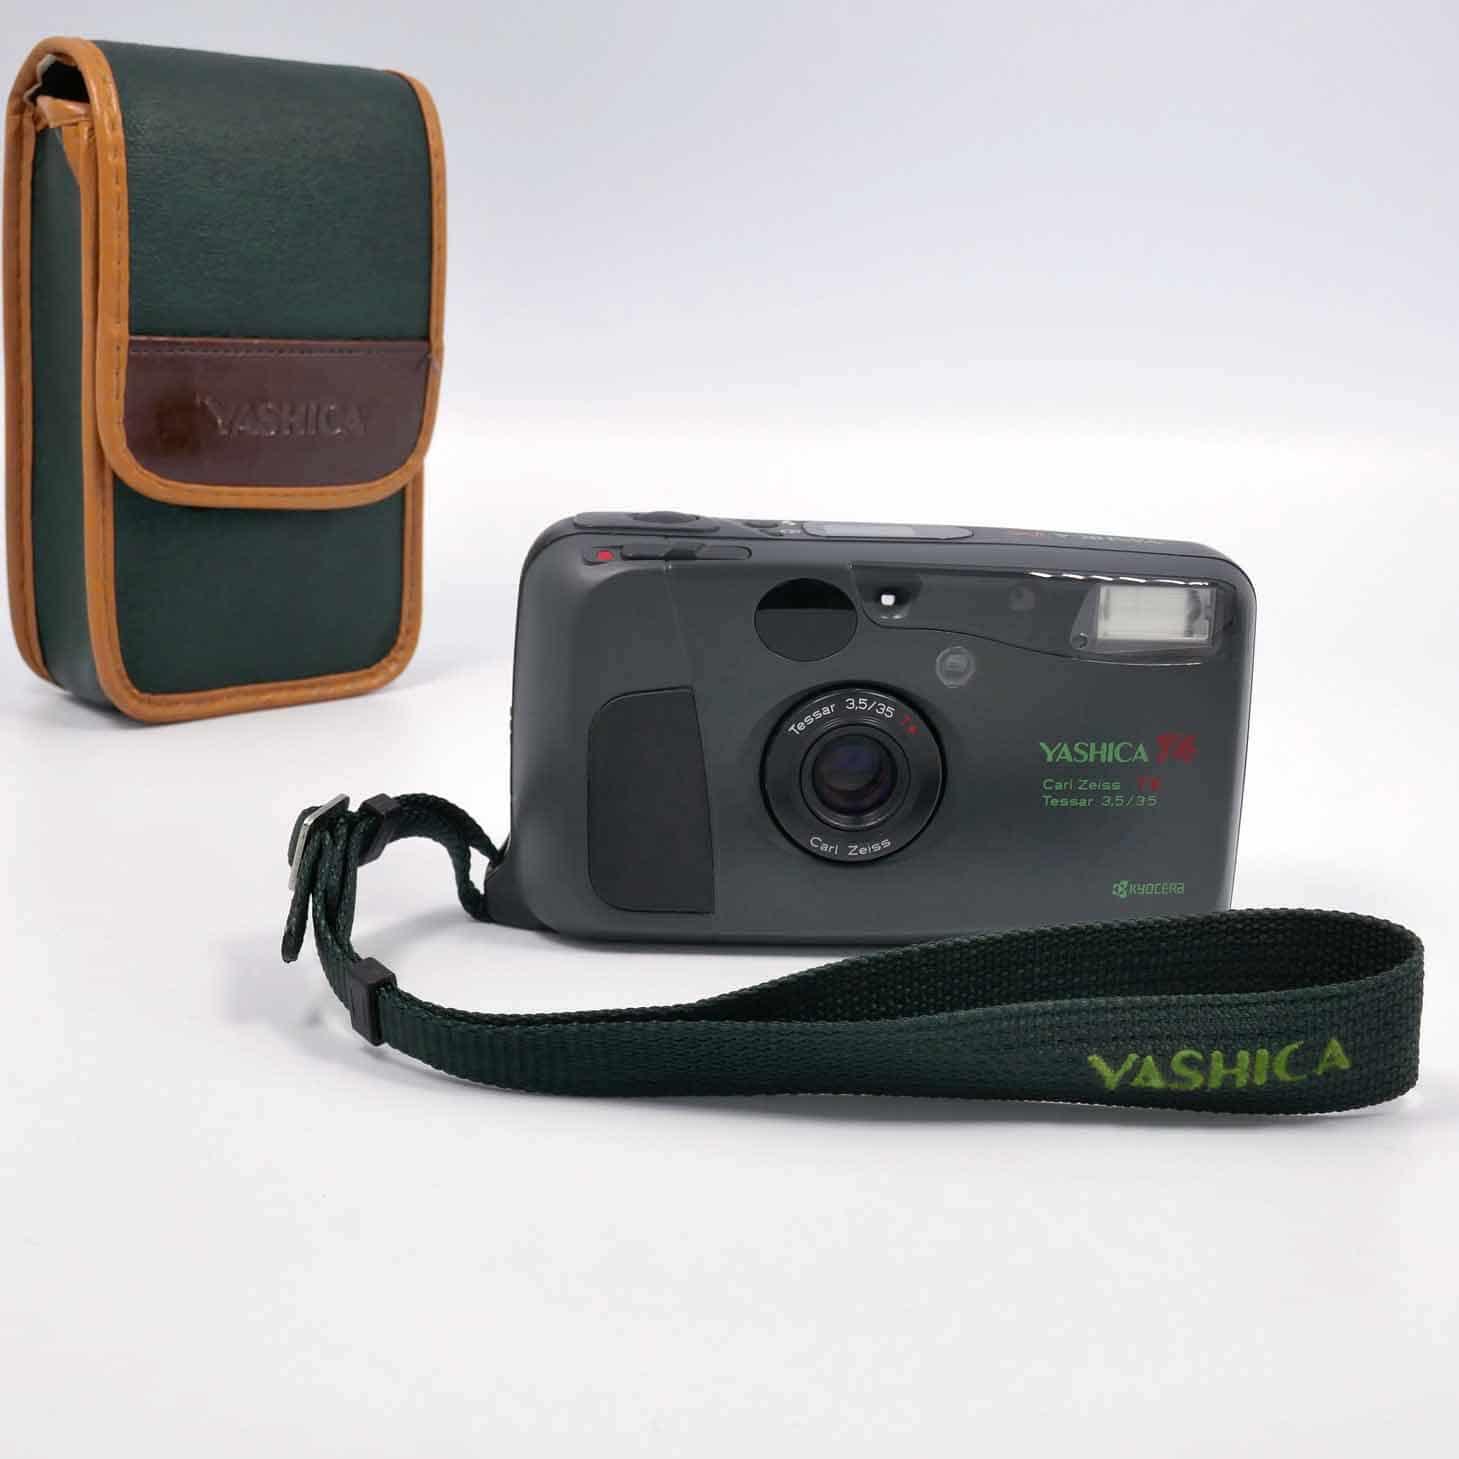 clean-cameras-Yashica-T4-Safari-05